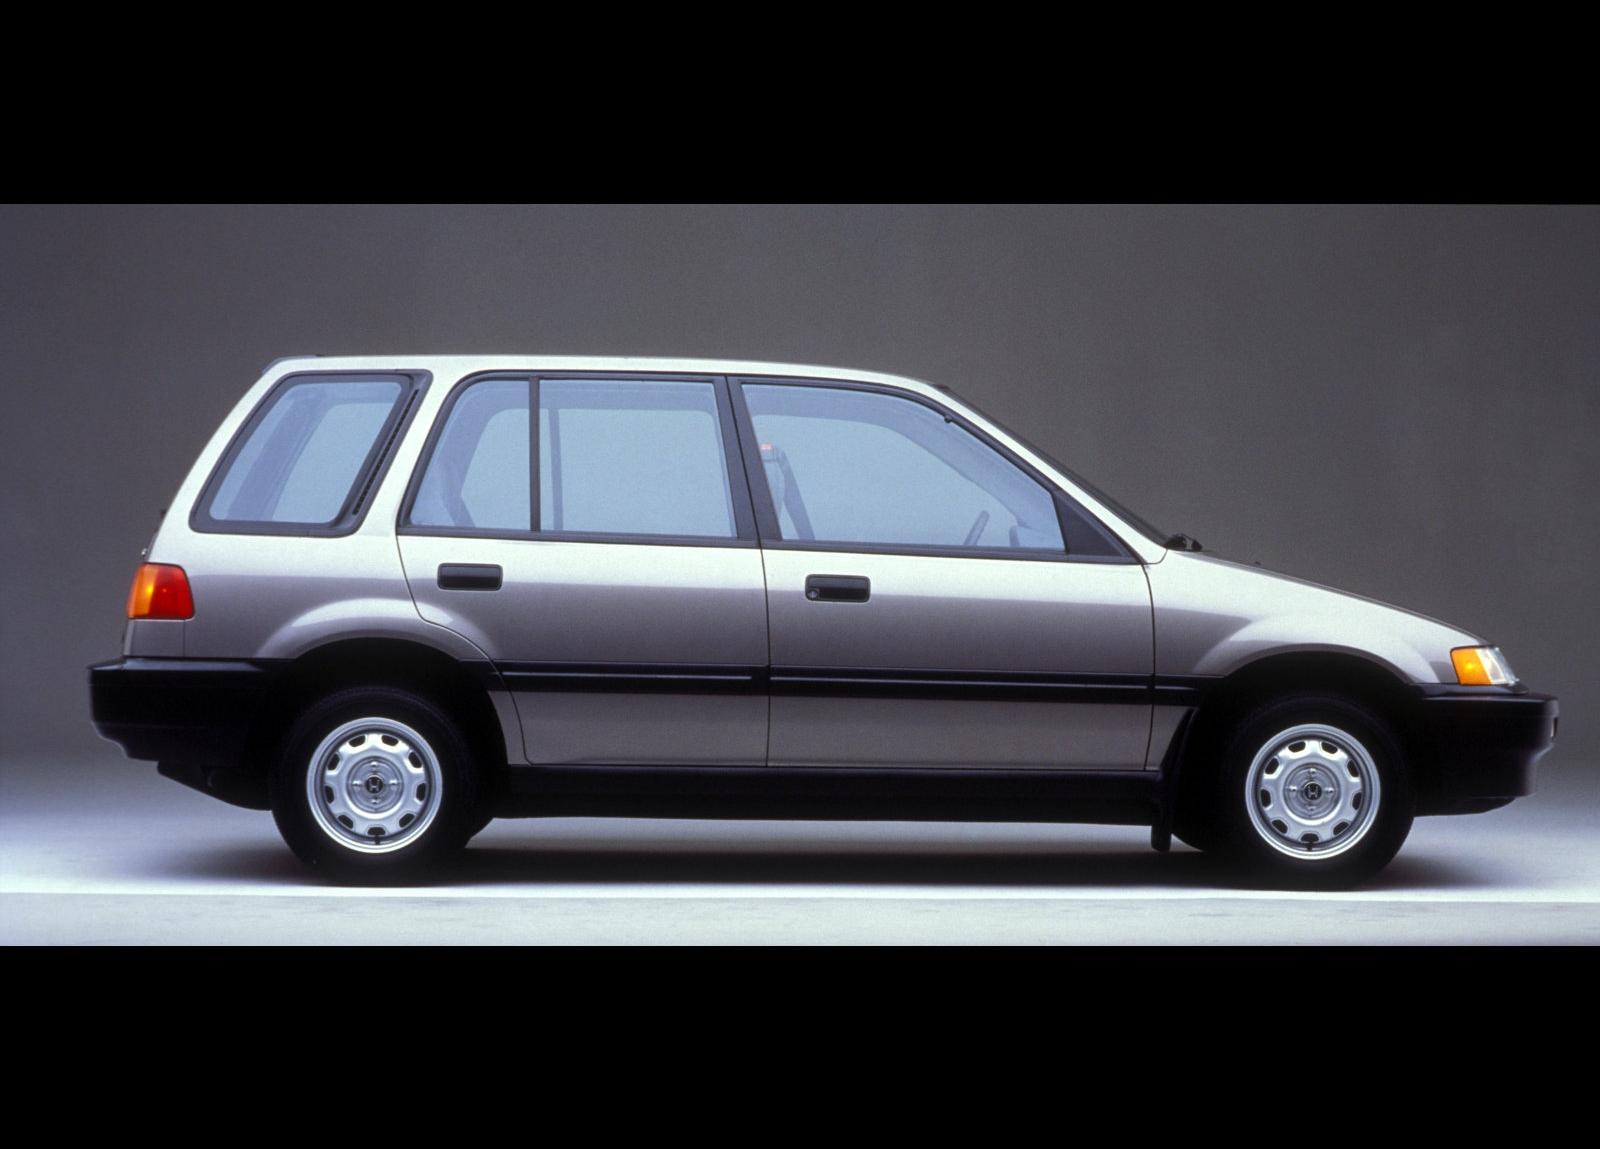 http://2.bp.blogspot.com/-2M6paCuWqNY/Tmtp7Ja9HOI/AAAAAAAAAYw/R8BhY2KSIHA/s1600/Honda-Civic_Wagon_1990_1600x1200_wallpaper_03.jpg